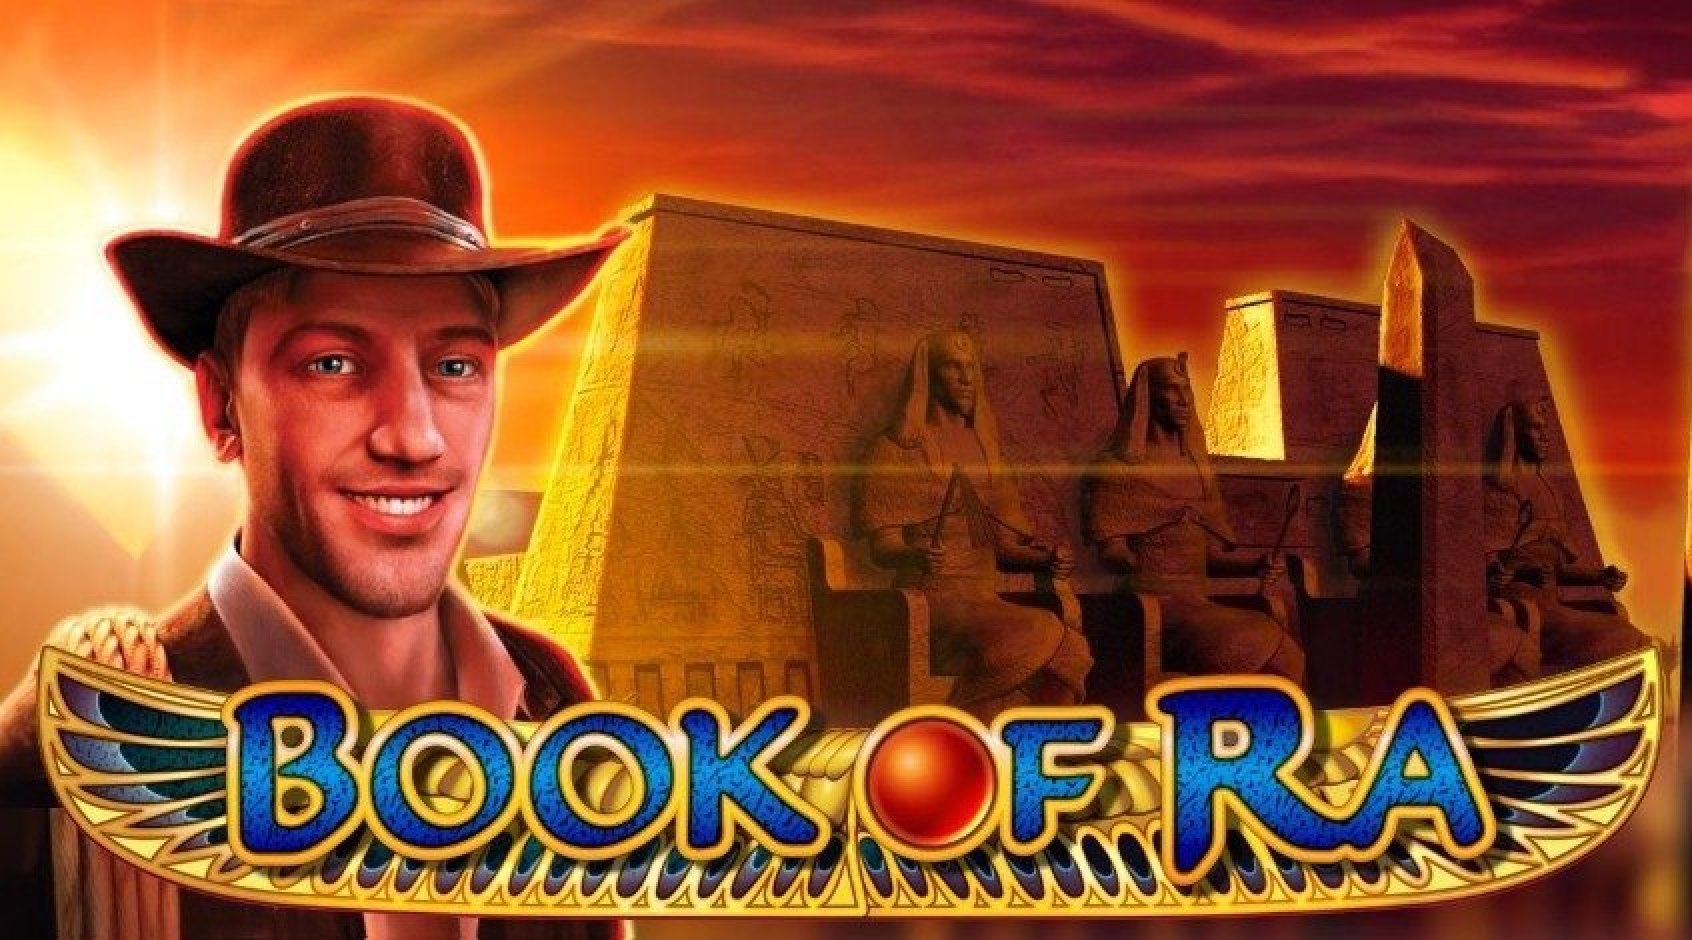 Book of Ra (Книга Ра, Книжки)